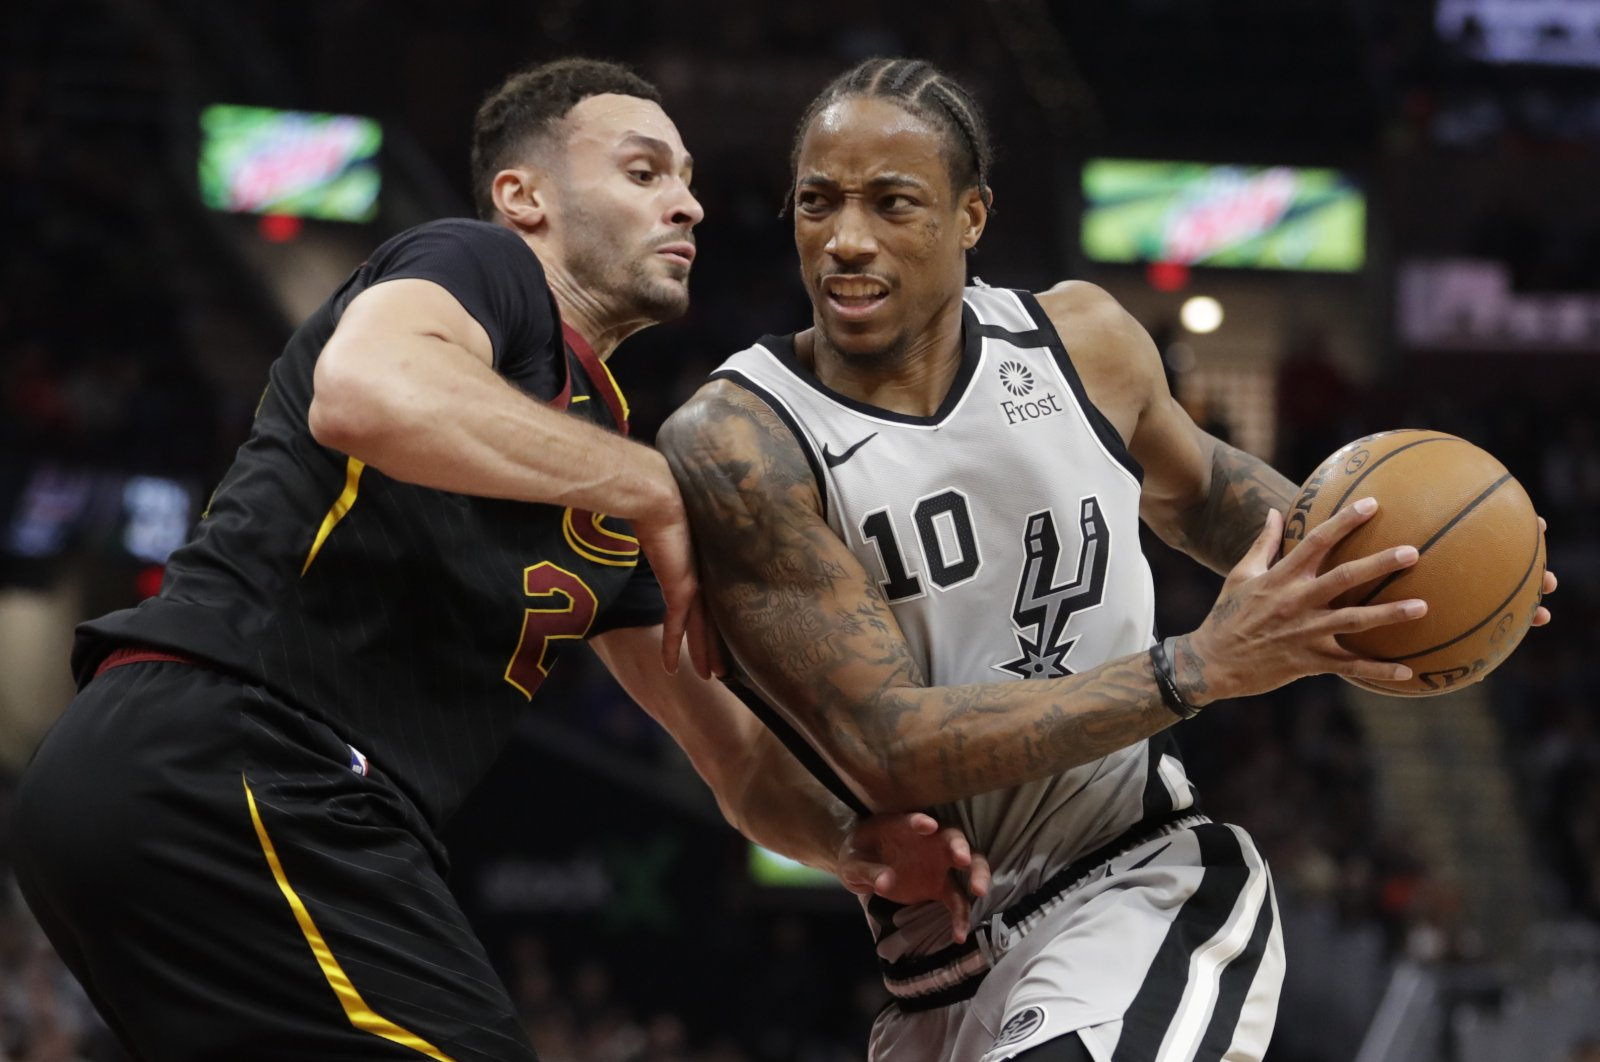 San Antonio Spurs' DeMar DeRozan (10) drives past Cleveland Cavaliers' Larry Nance Jr. (22) during an NBA game in Cleveland, U.S., March 8, 2020. (AP Photo)